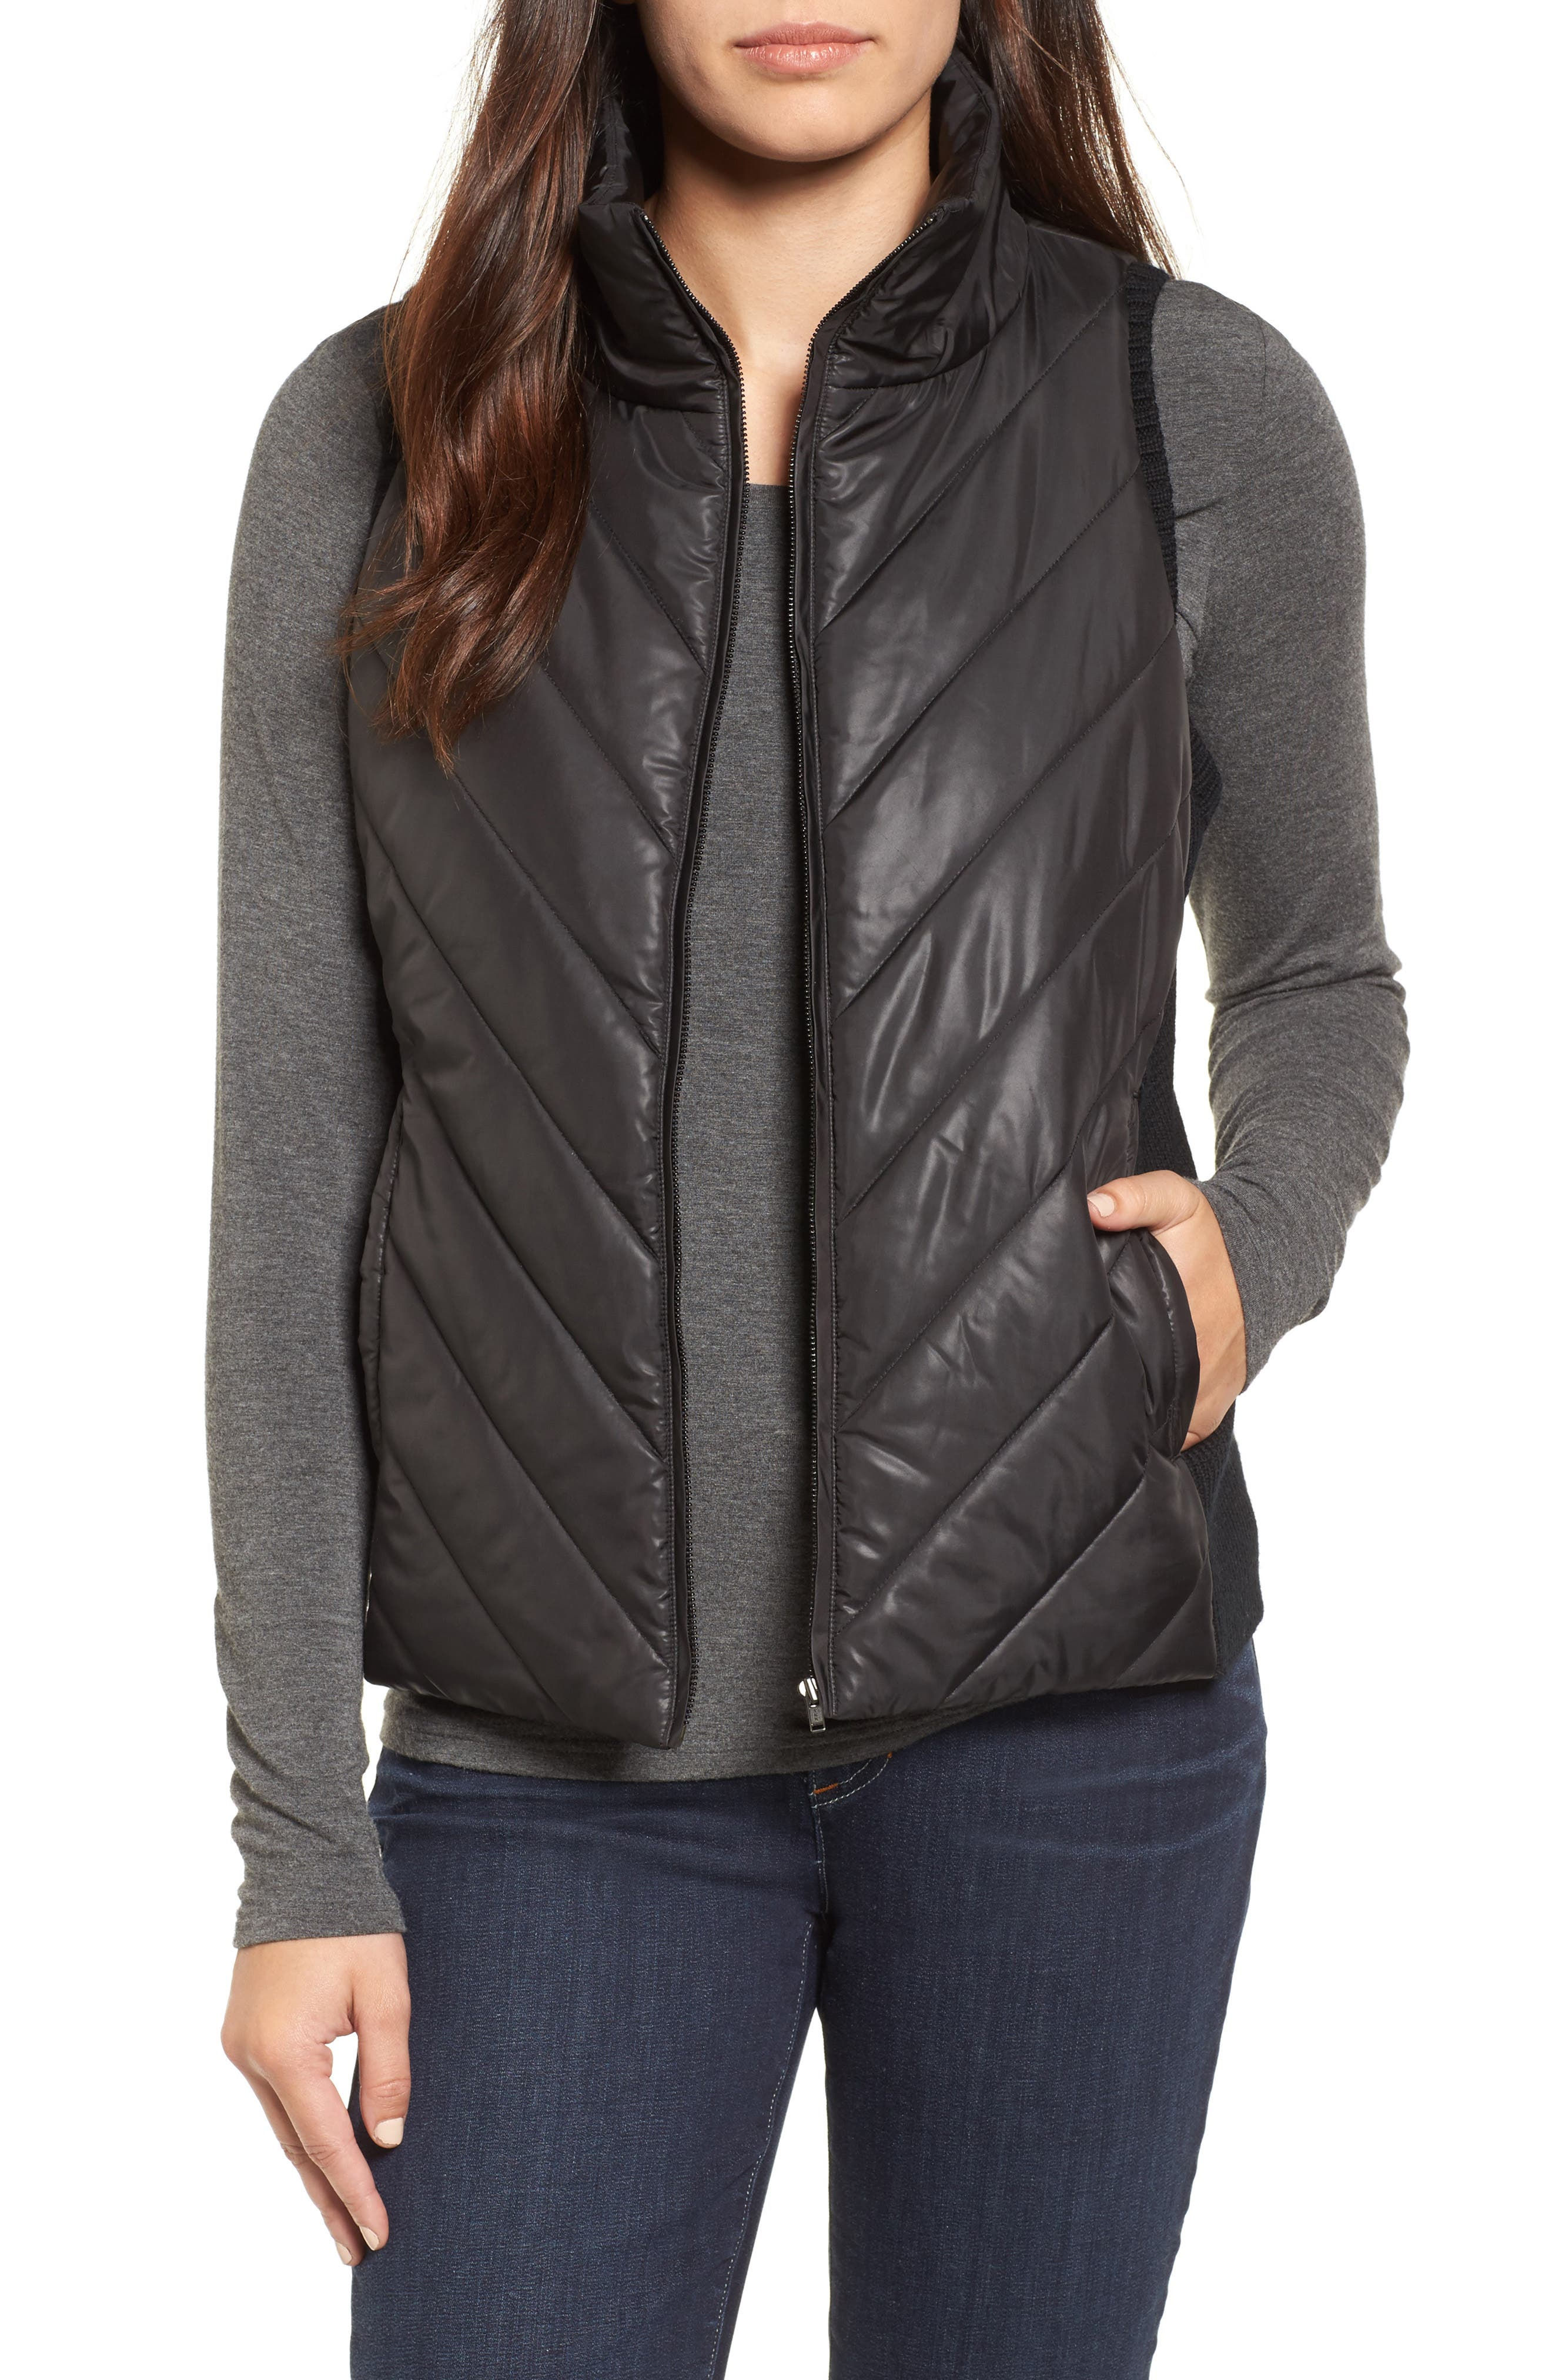 Alternate Image 1 Selected - Eileen Fisher Merino Wool Trim Puffer Vest (Regular & Petite)